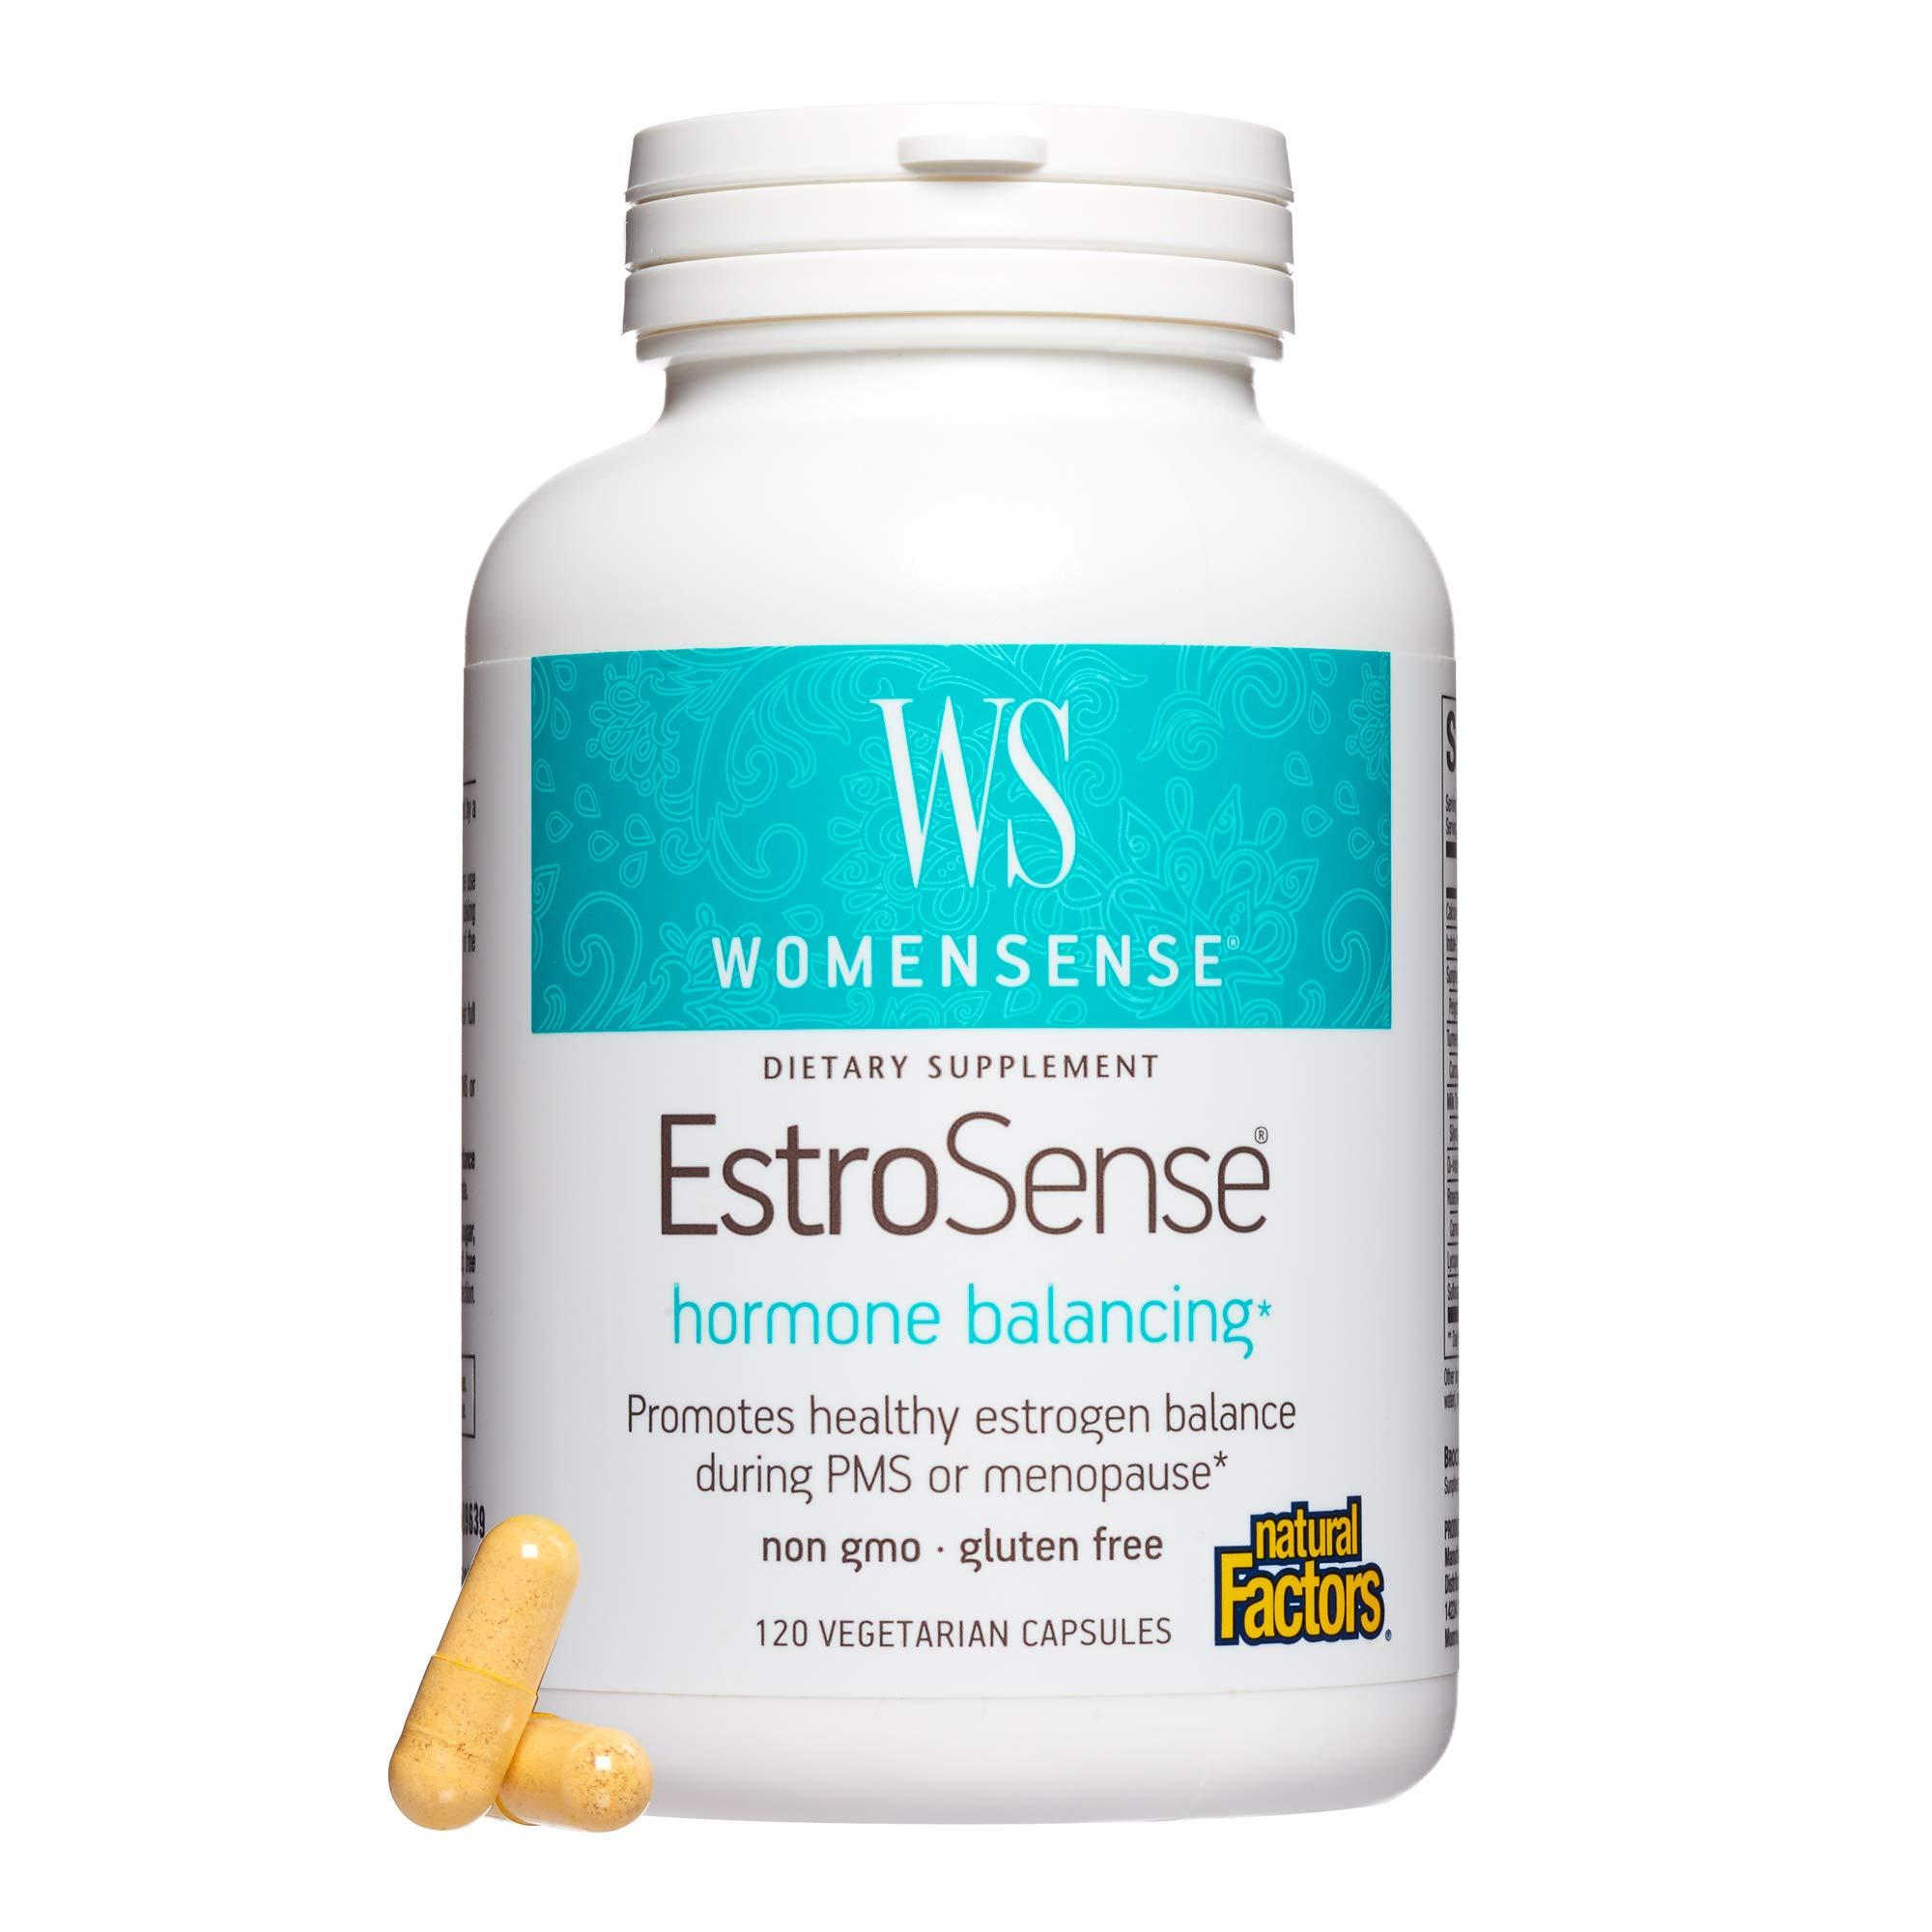 Natural Factors - WomenSense EstroSense, Promotes Estrogen and Hormone Balance for Women, 120 Vegetarian Capsules